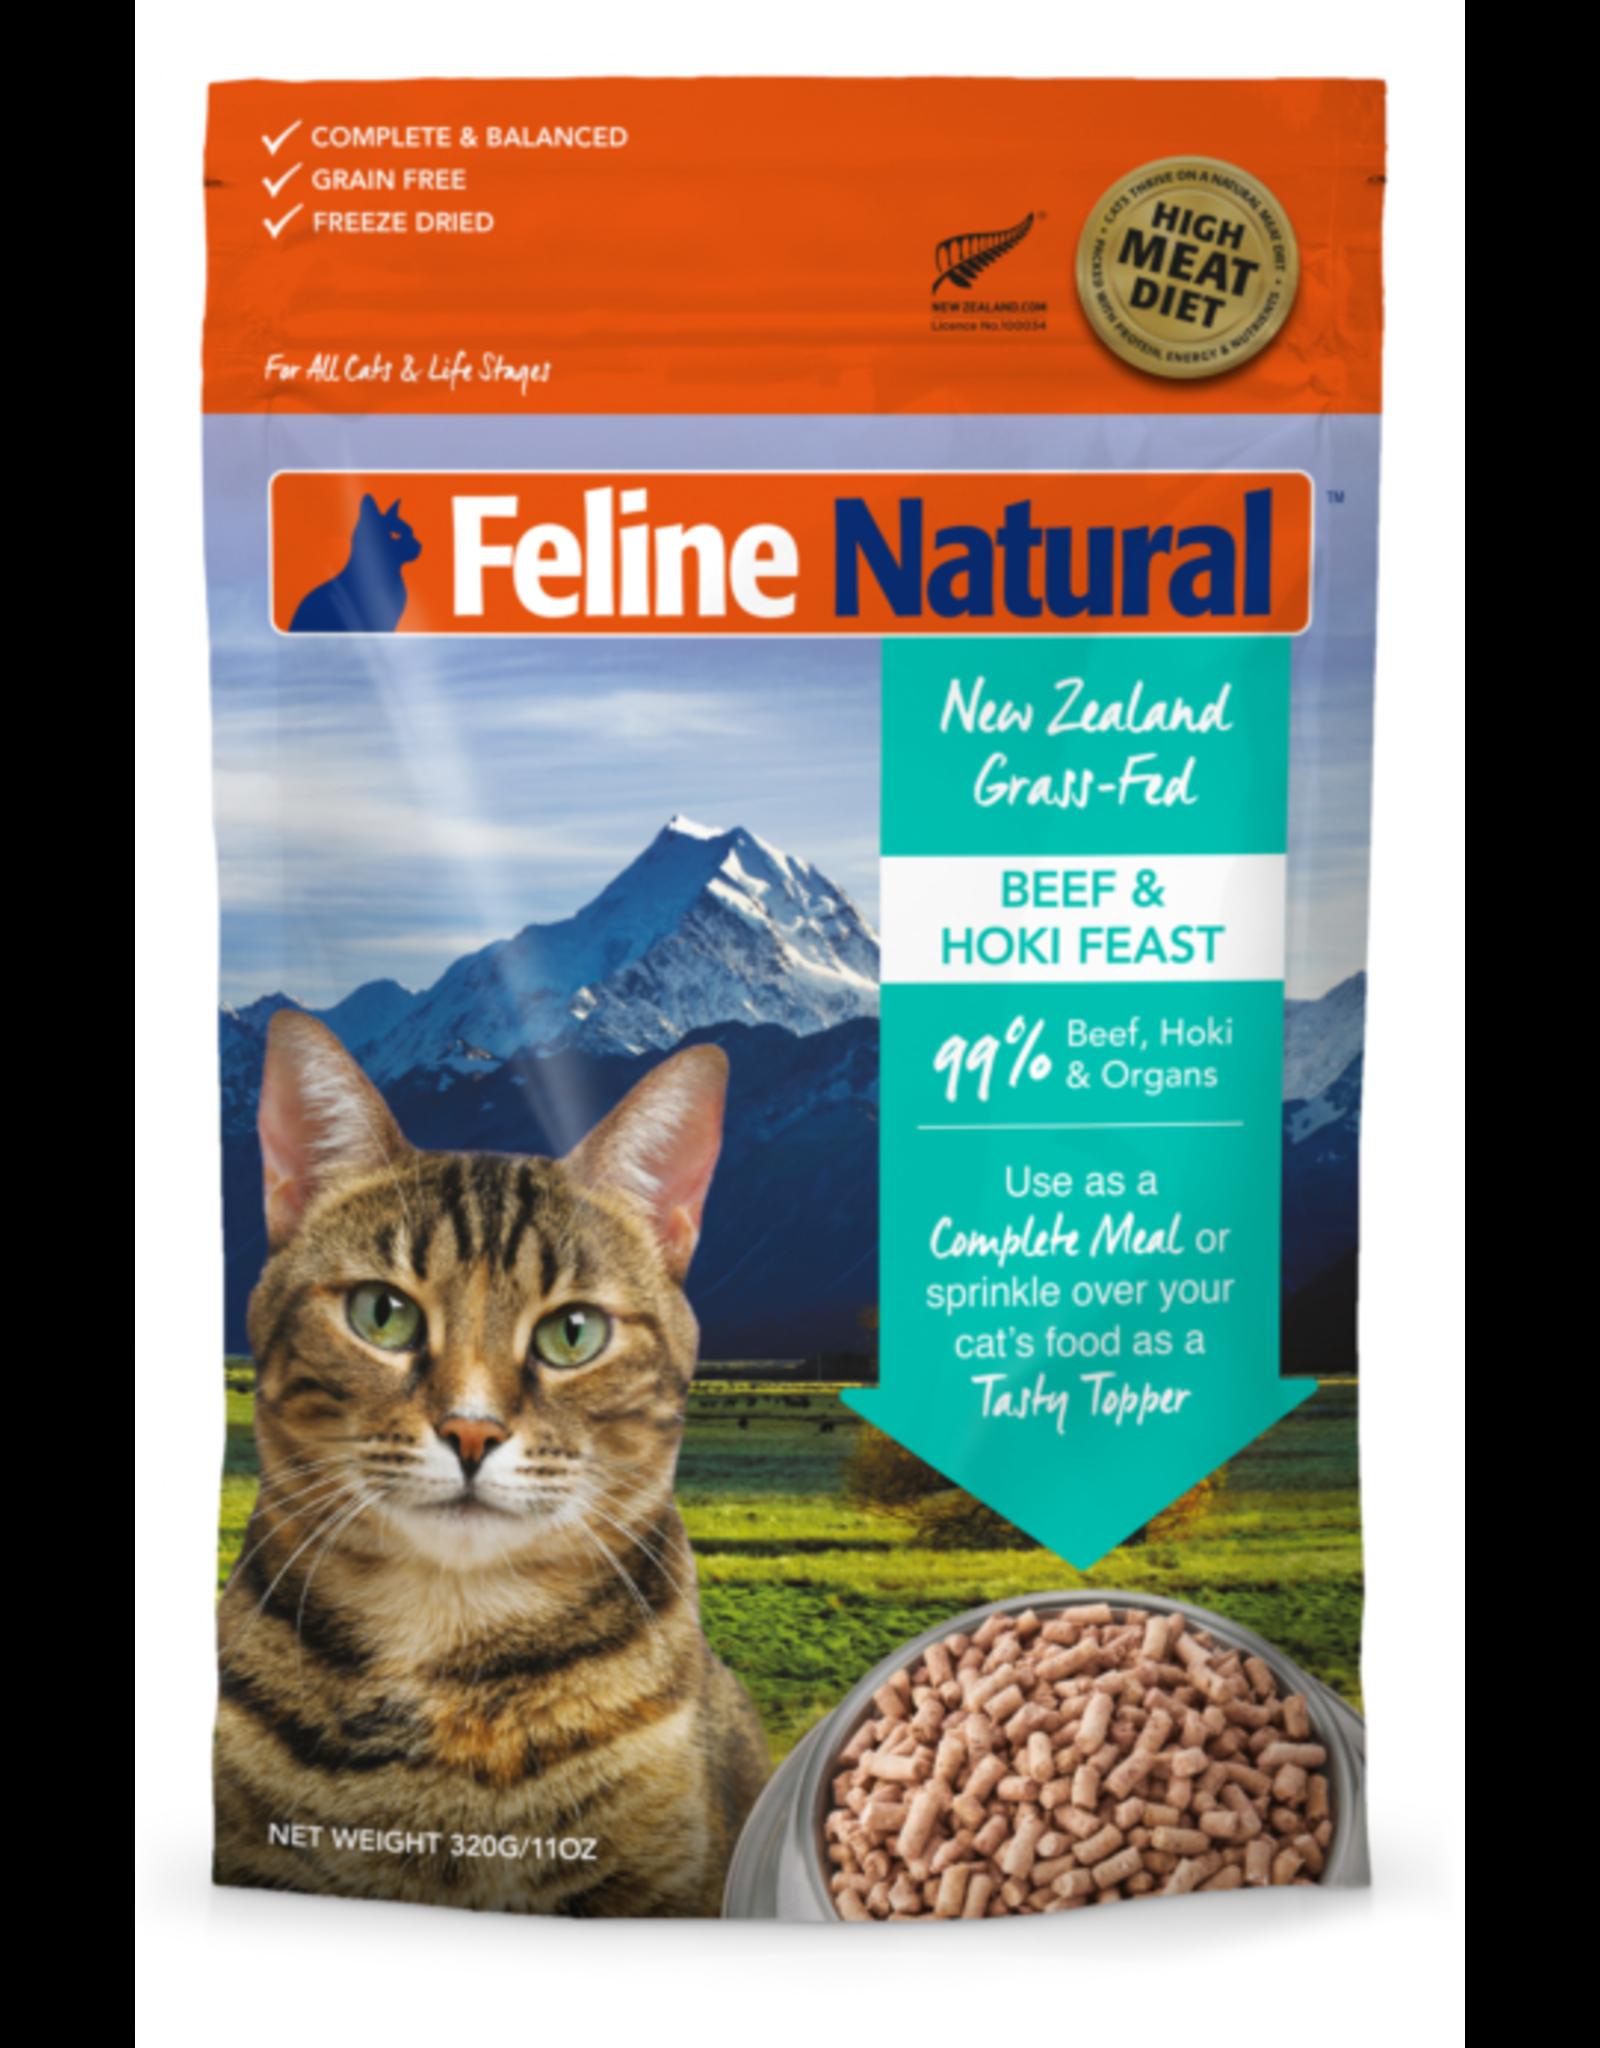 Feline Natural Feline Natural Freeze Dried Beef and Hoki Feast